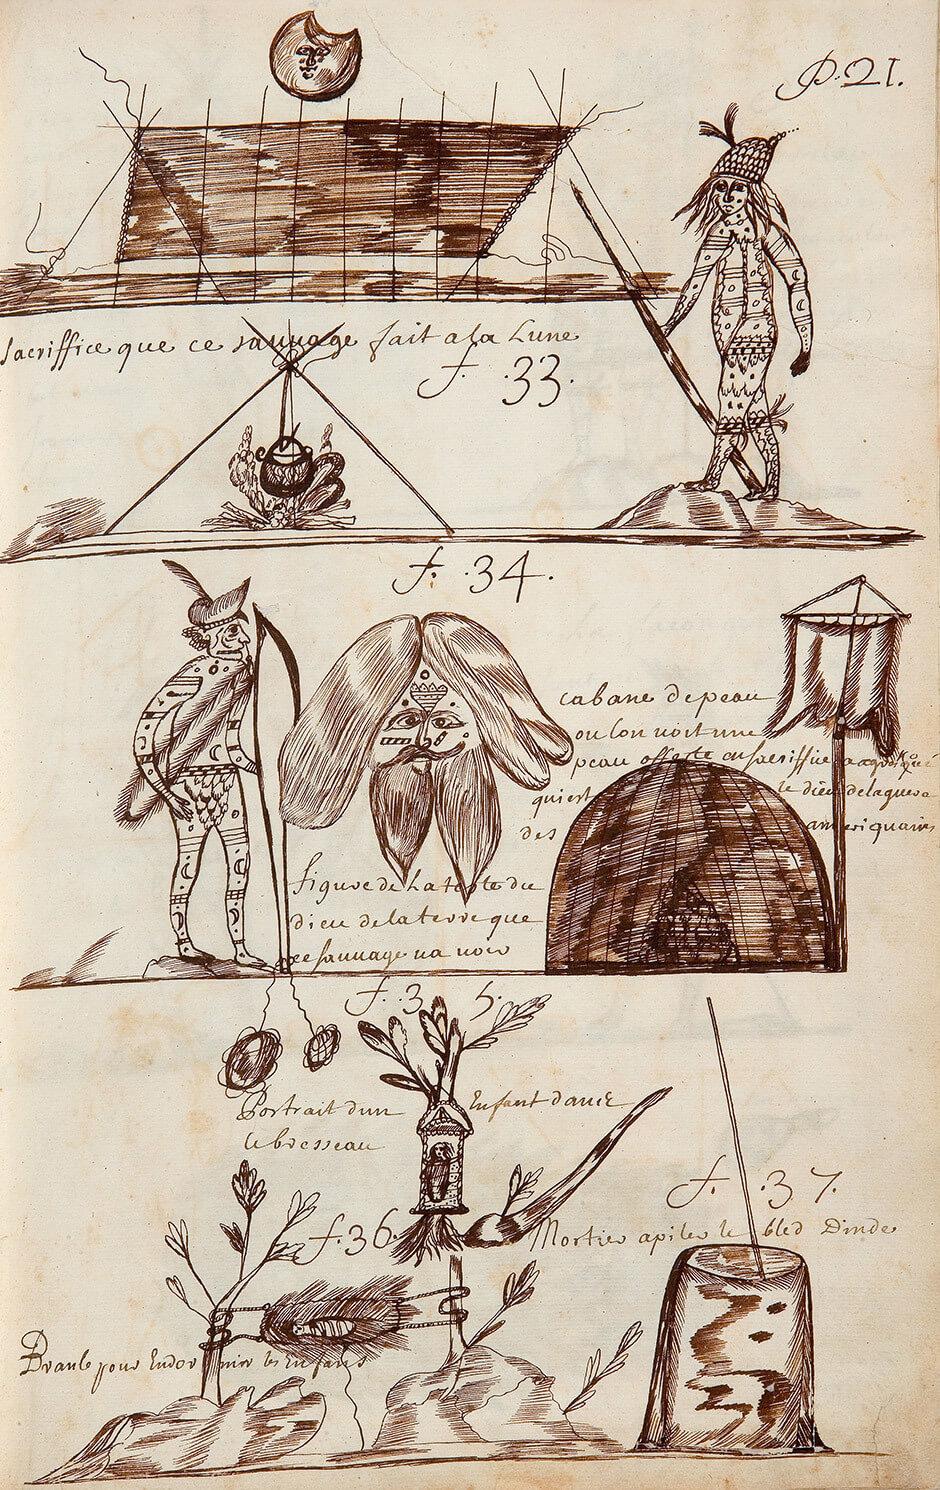 Louis Nicolas,Aboriginal Rituals, n.d.